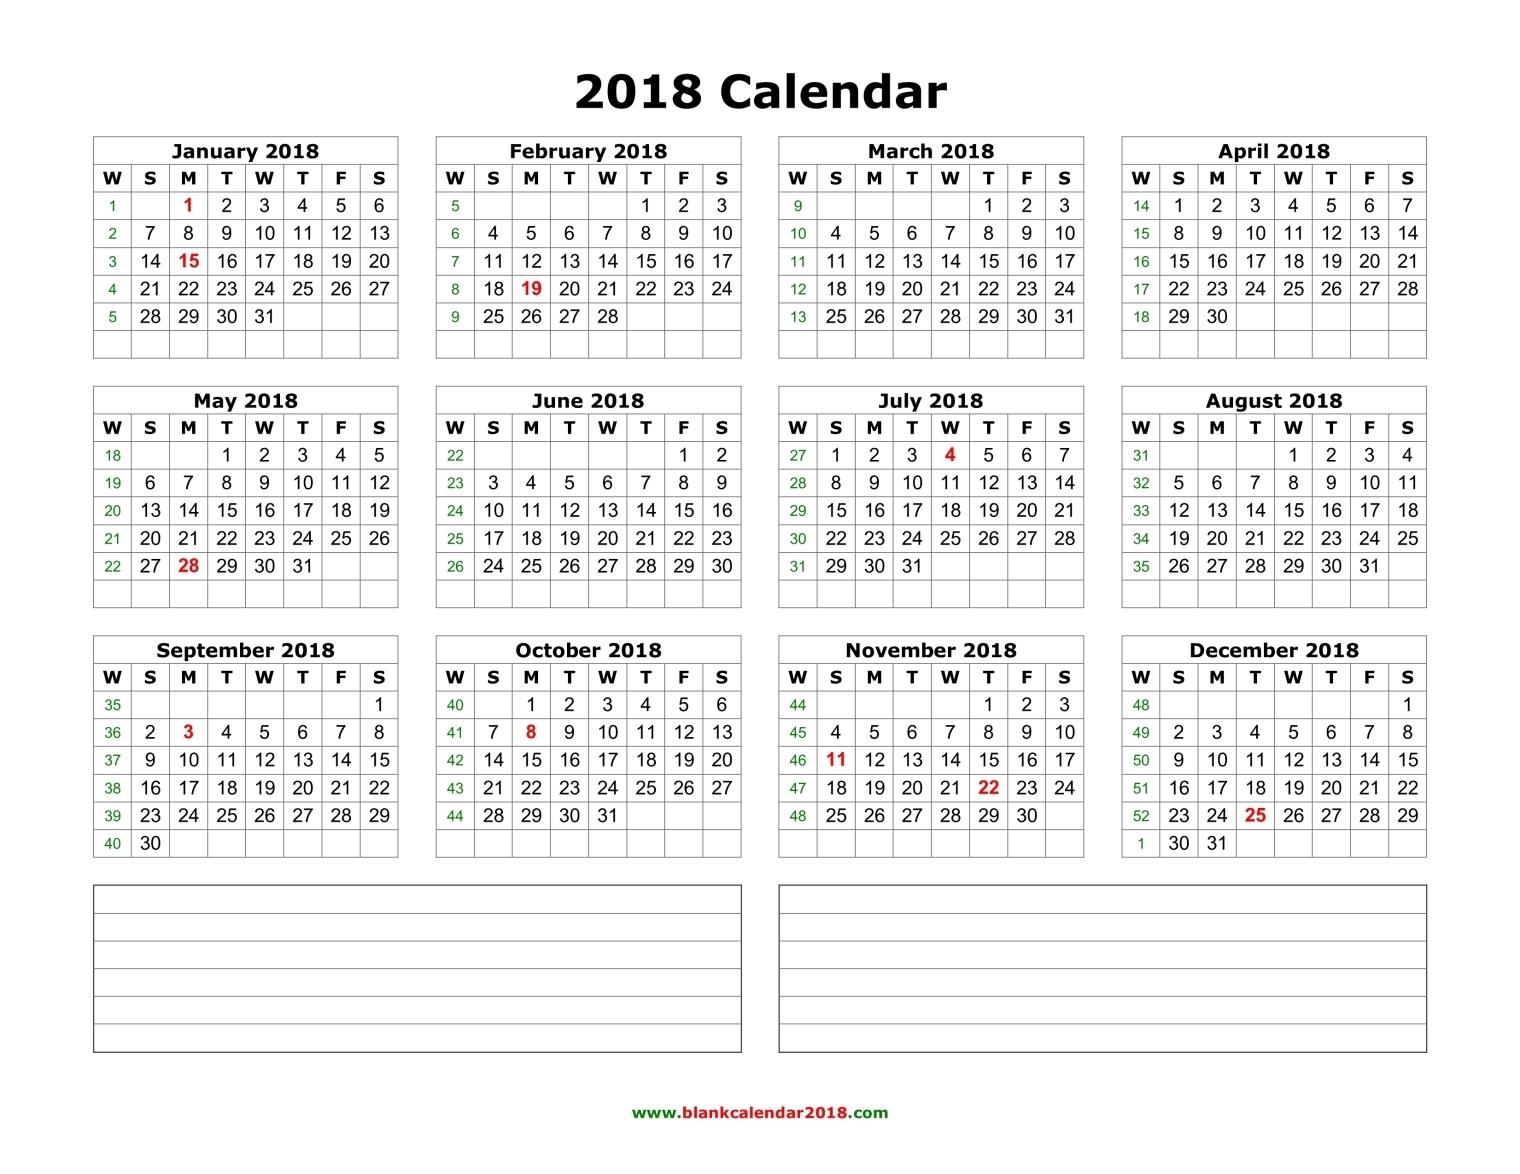 Blank February Calendar 2018 Editable | Whatisthedatetoday.Com